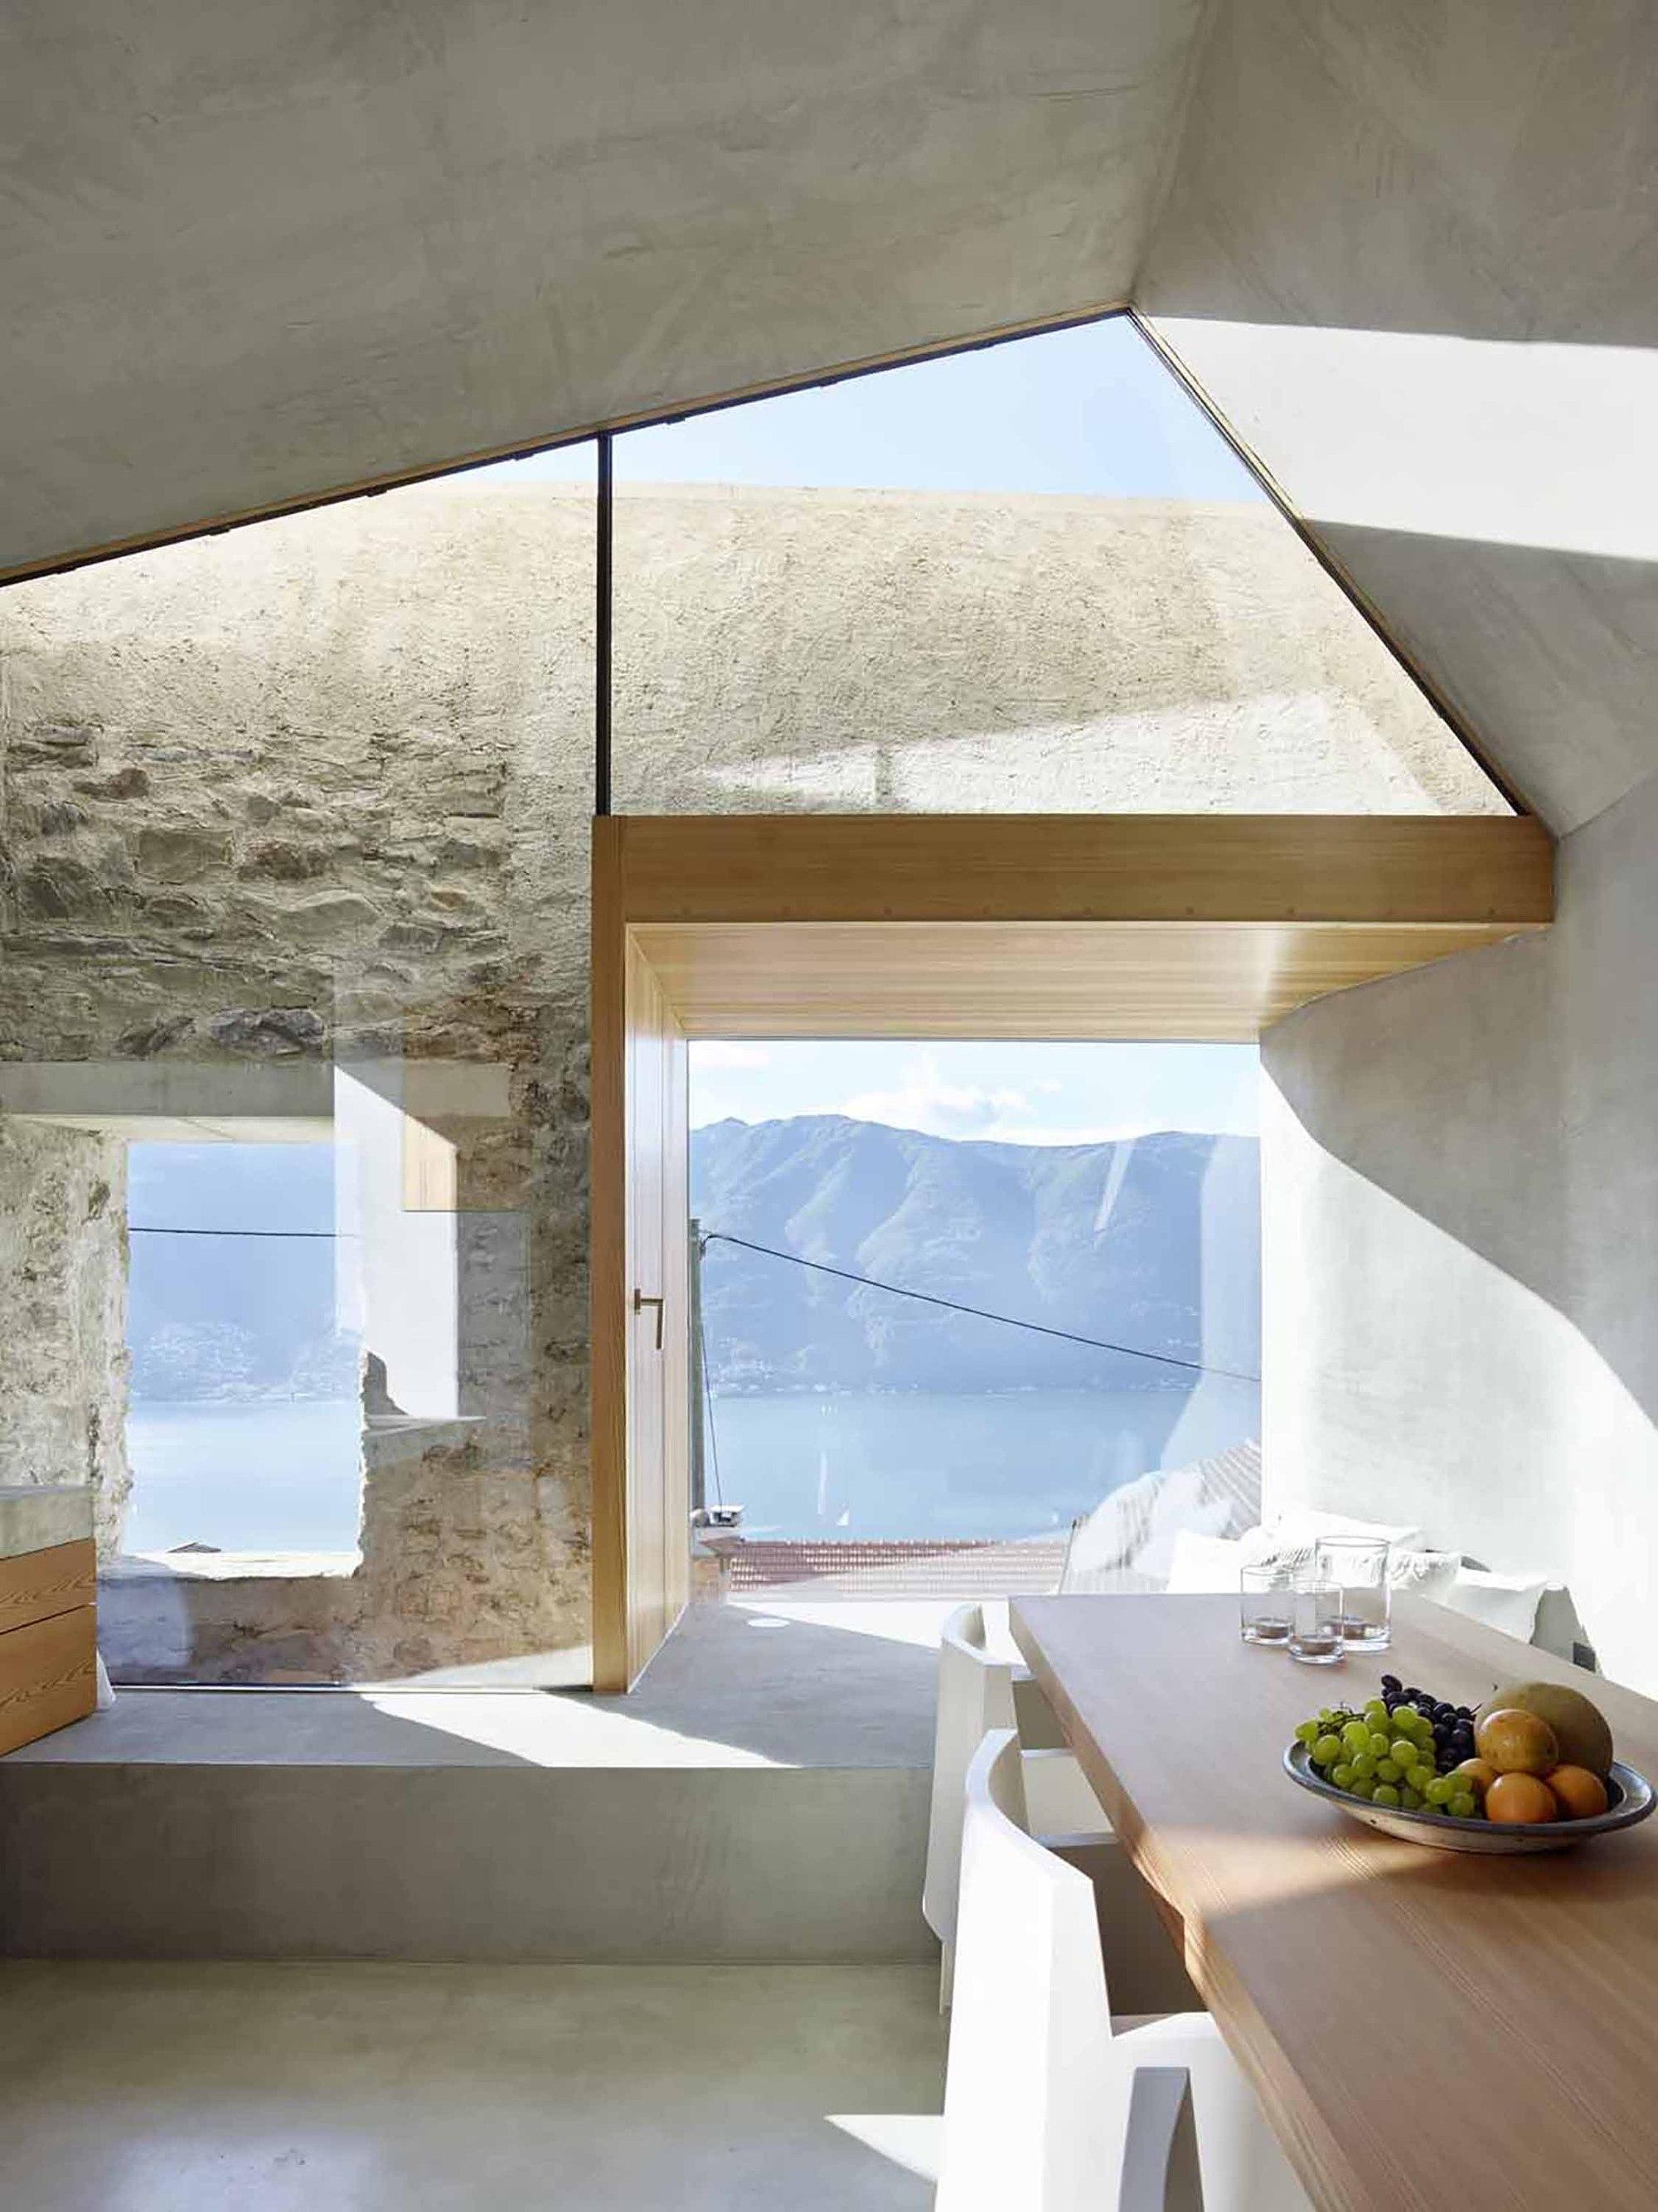 543dd5e7c07a80762d00024e_stone-house-transformation-in-scaiano-wespi-de-meuron-romeo-architects_1430_cf030655.jpg